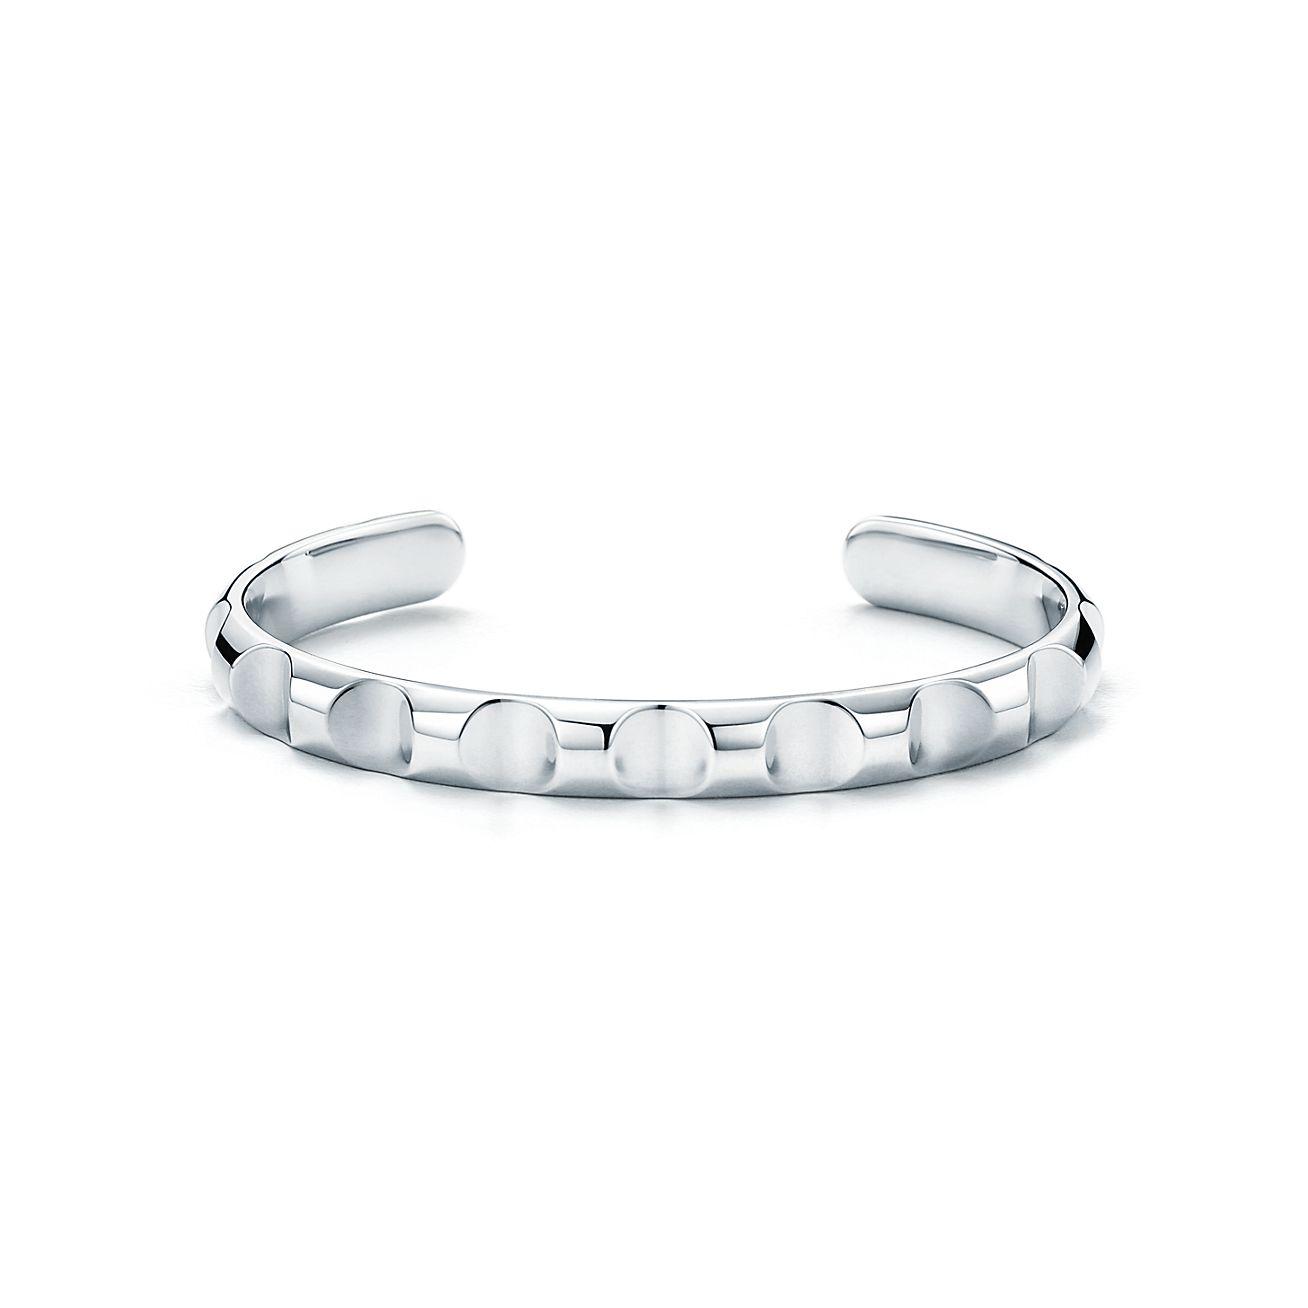 Palomas Groove narrow cuff in titanium, small Tiffany & Co.